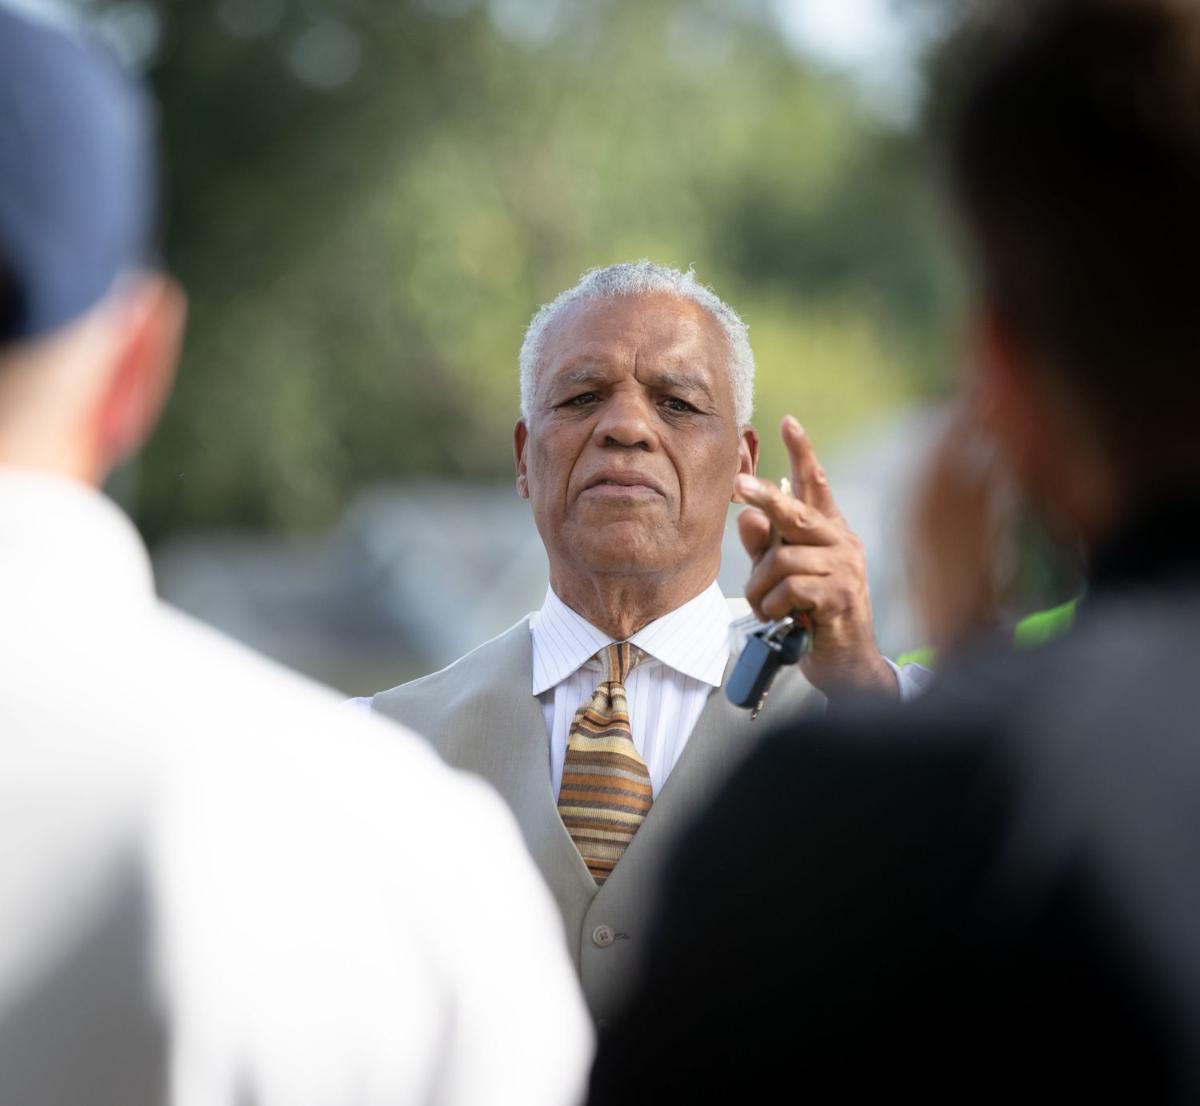 Yale Park Apts Omaha Ne: Omaha Can't Use Evidence That Led To Mass Evacuation